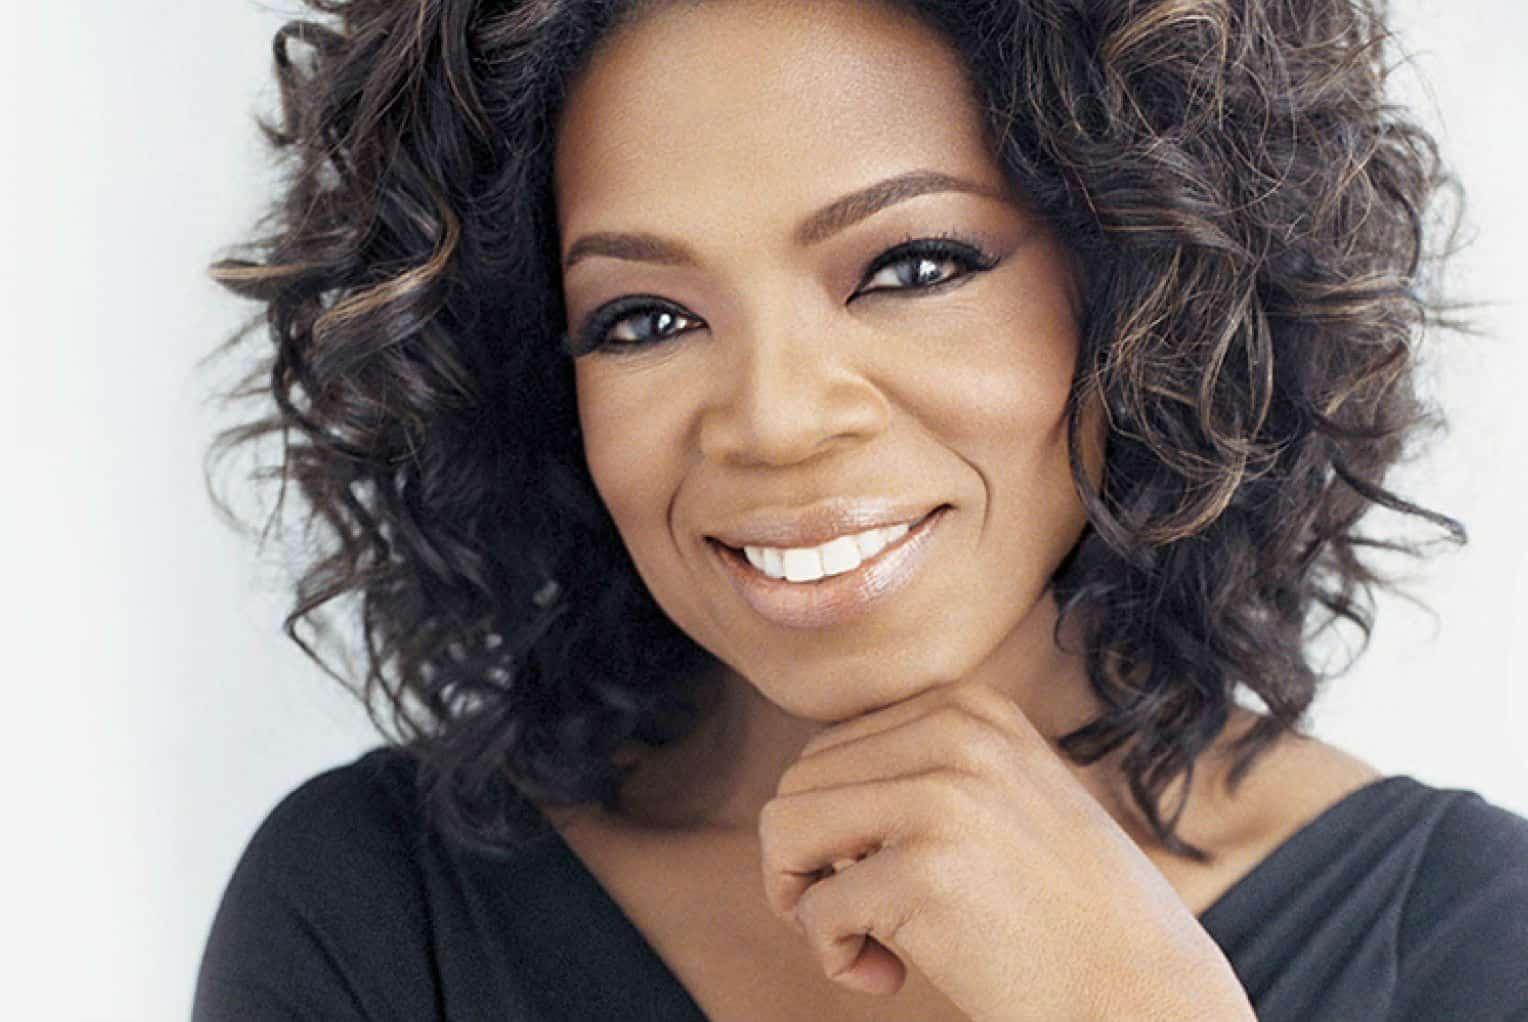 Celebrity Spotlight: Oprah Winfrey #HollywoodSpotlight #hollywood #moviestars #famous #actress #beautiful #celebrity #entertainment #celebrityoftheweek #movies #celebrities #Oprah #oprahwinfrey #beverlyhills #BevHillsMag